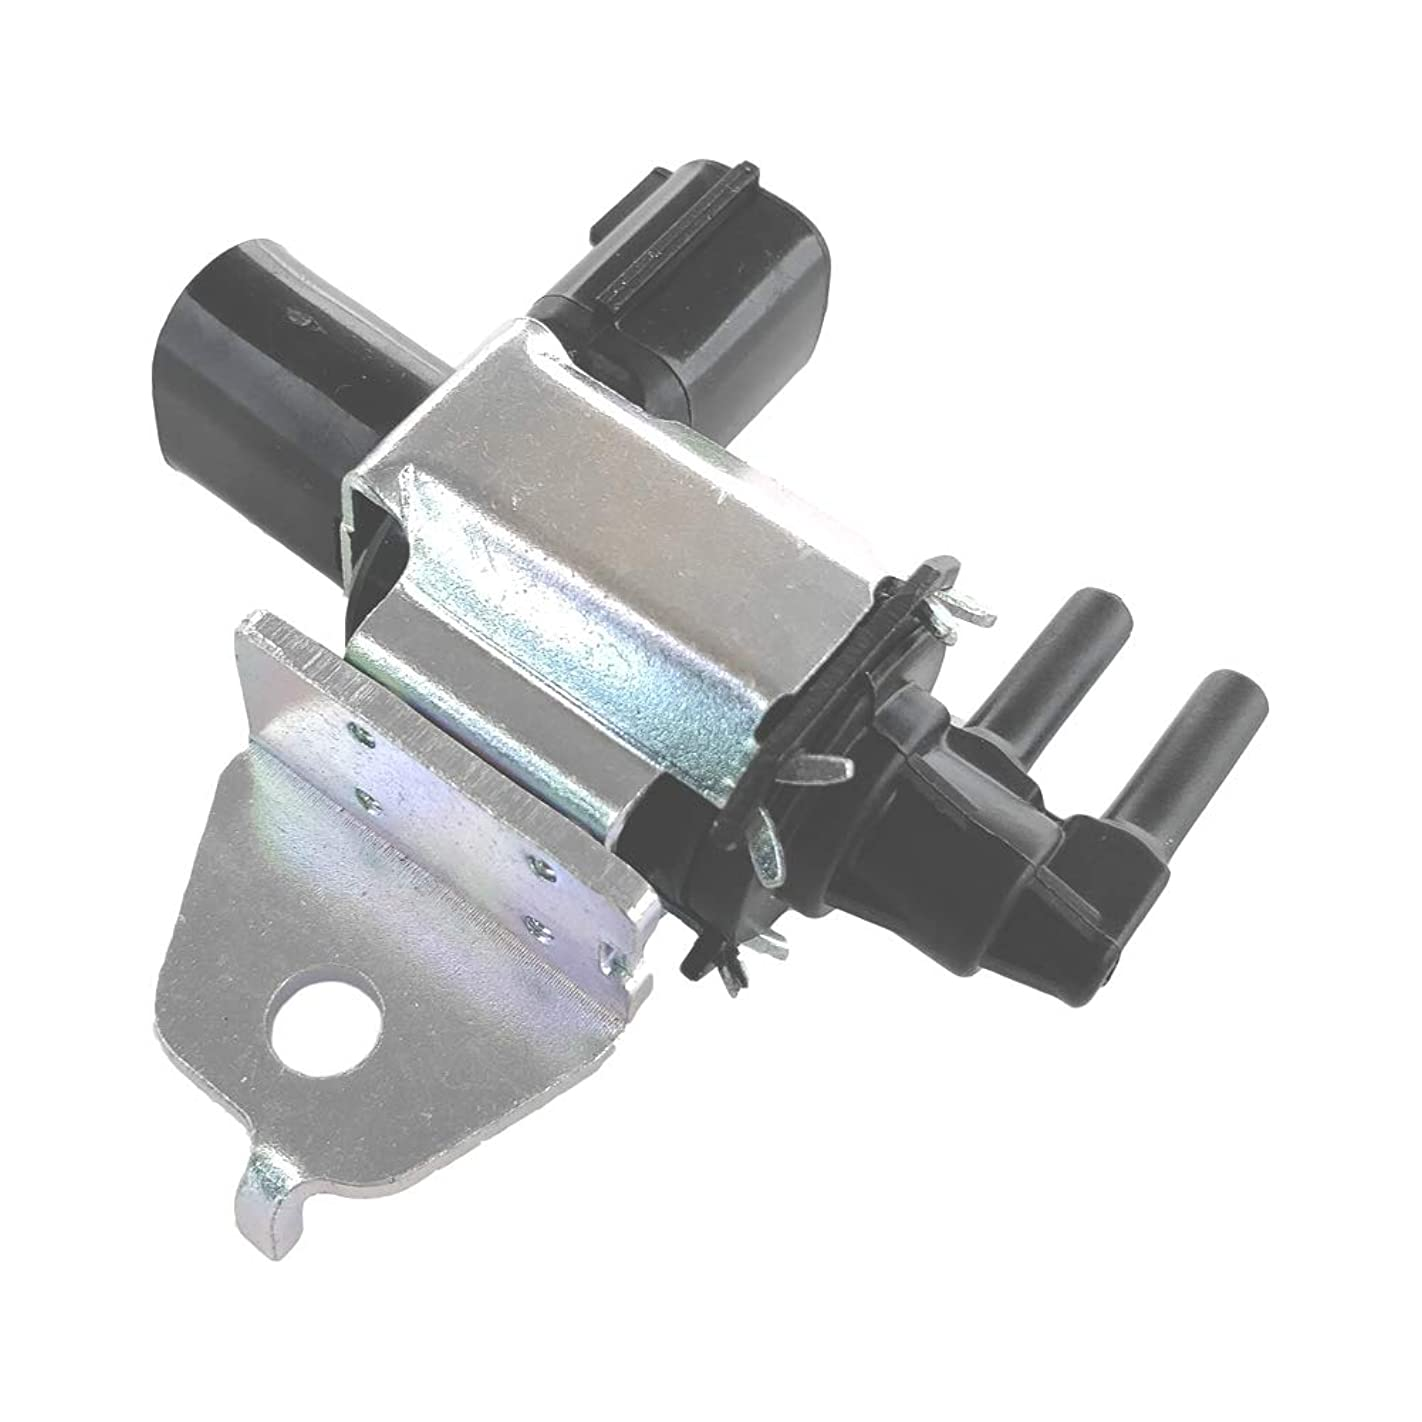 OKAY MOTOR VISA Control Solenoid Valve For Nissan Maxima Murano Altima Quest 3.5L Nv Frontier 4.0L r47259702042